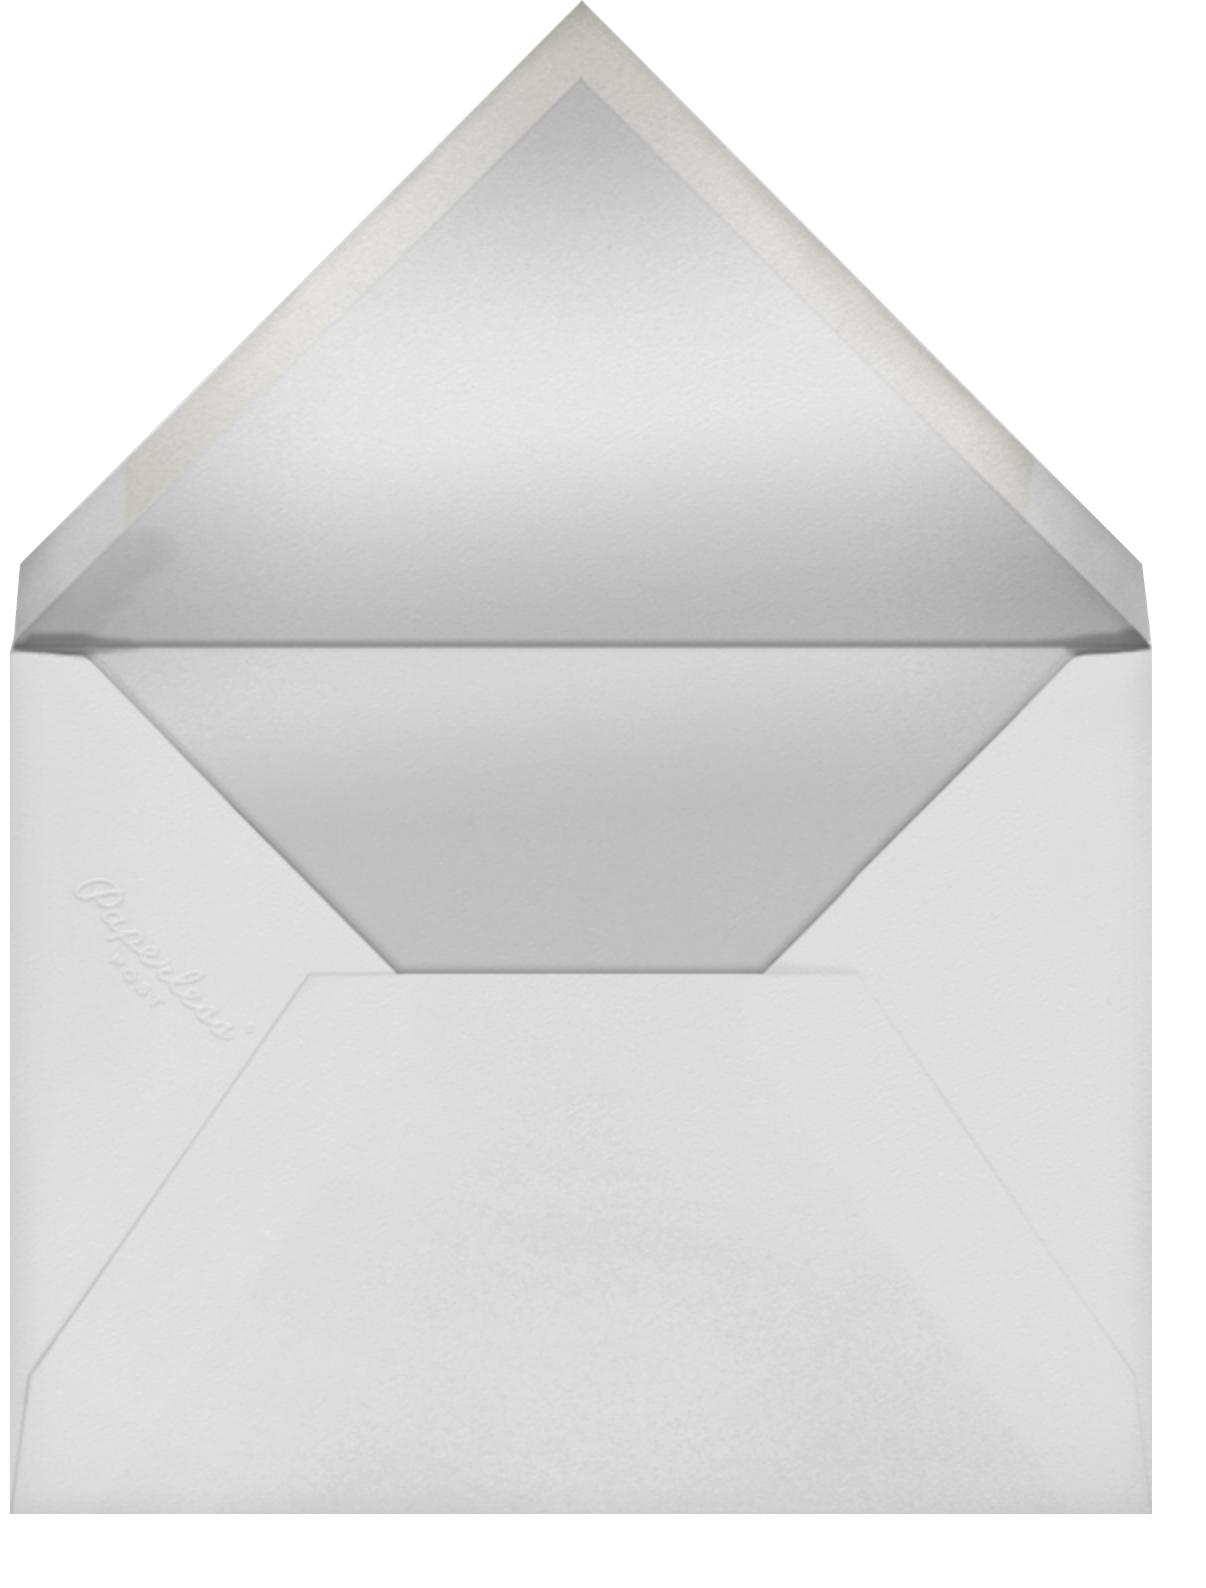 Betsy (Program) - Capri - Liberty - Menus and programs - envelope back